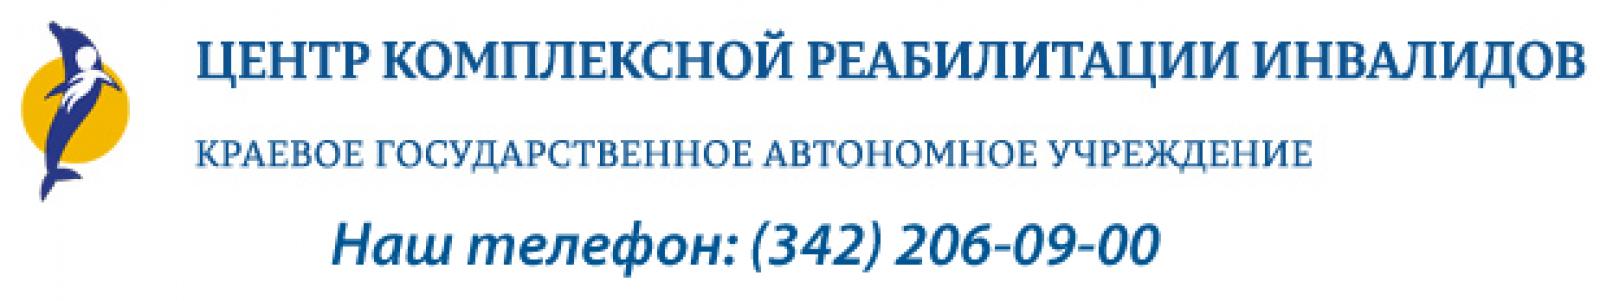 cropped-rehab_logonew1-e1447667324502.png